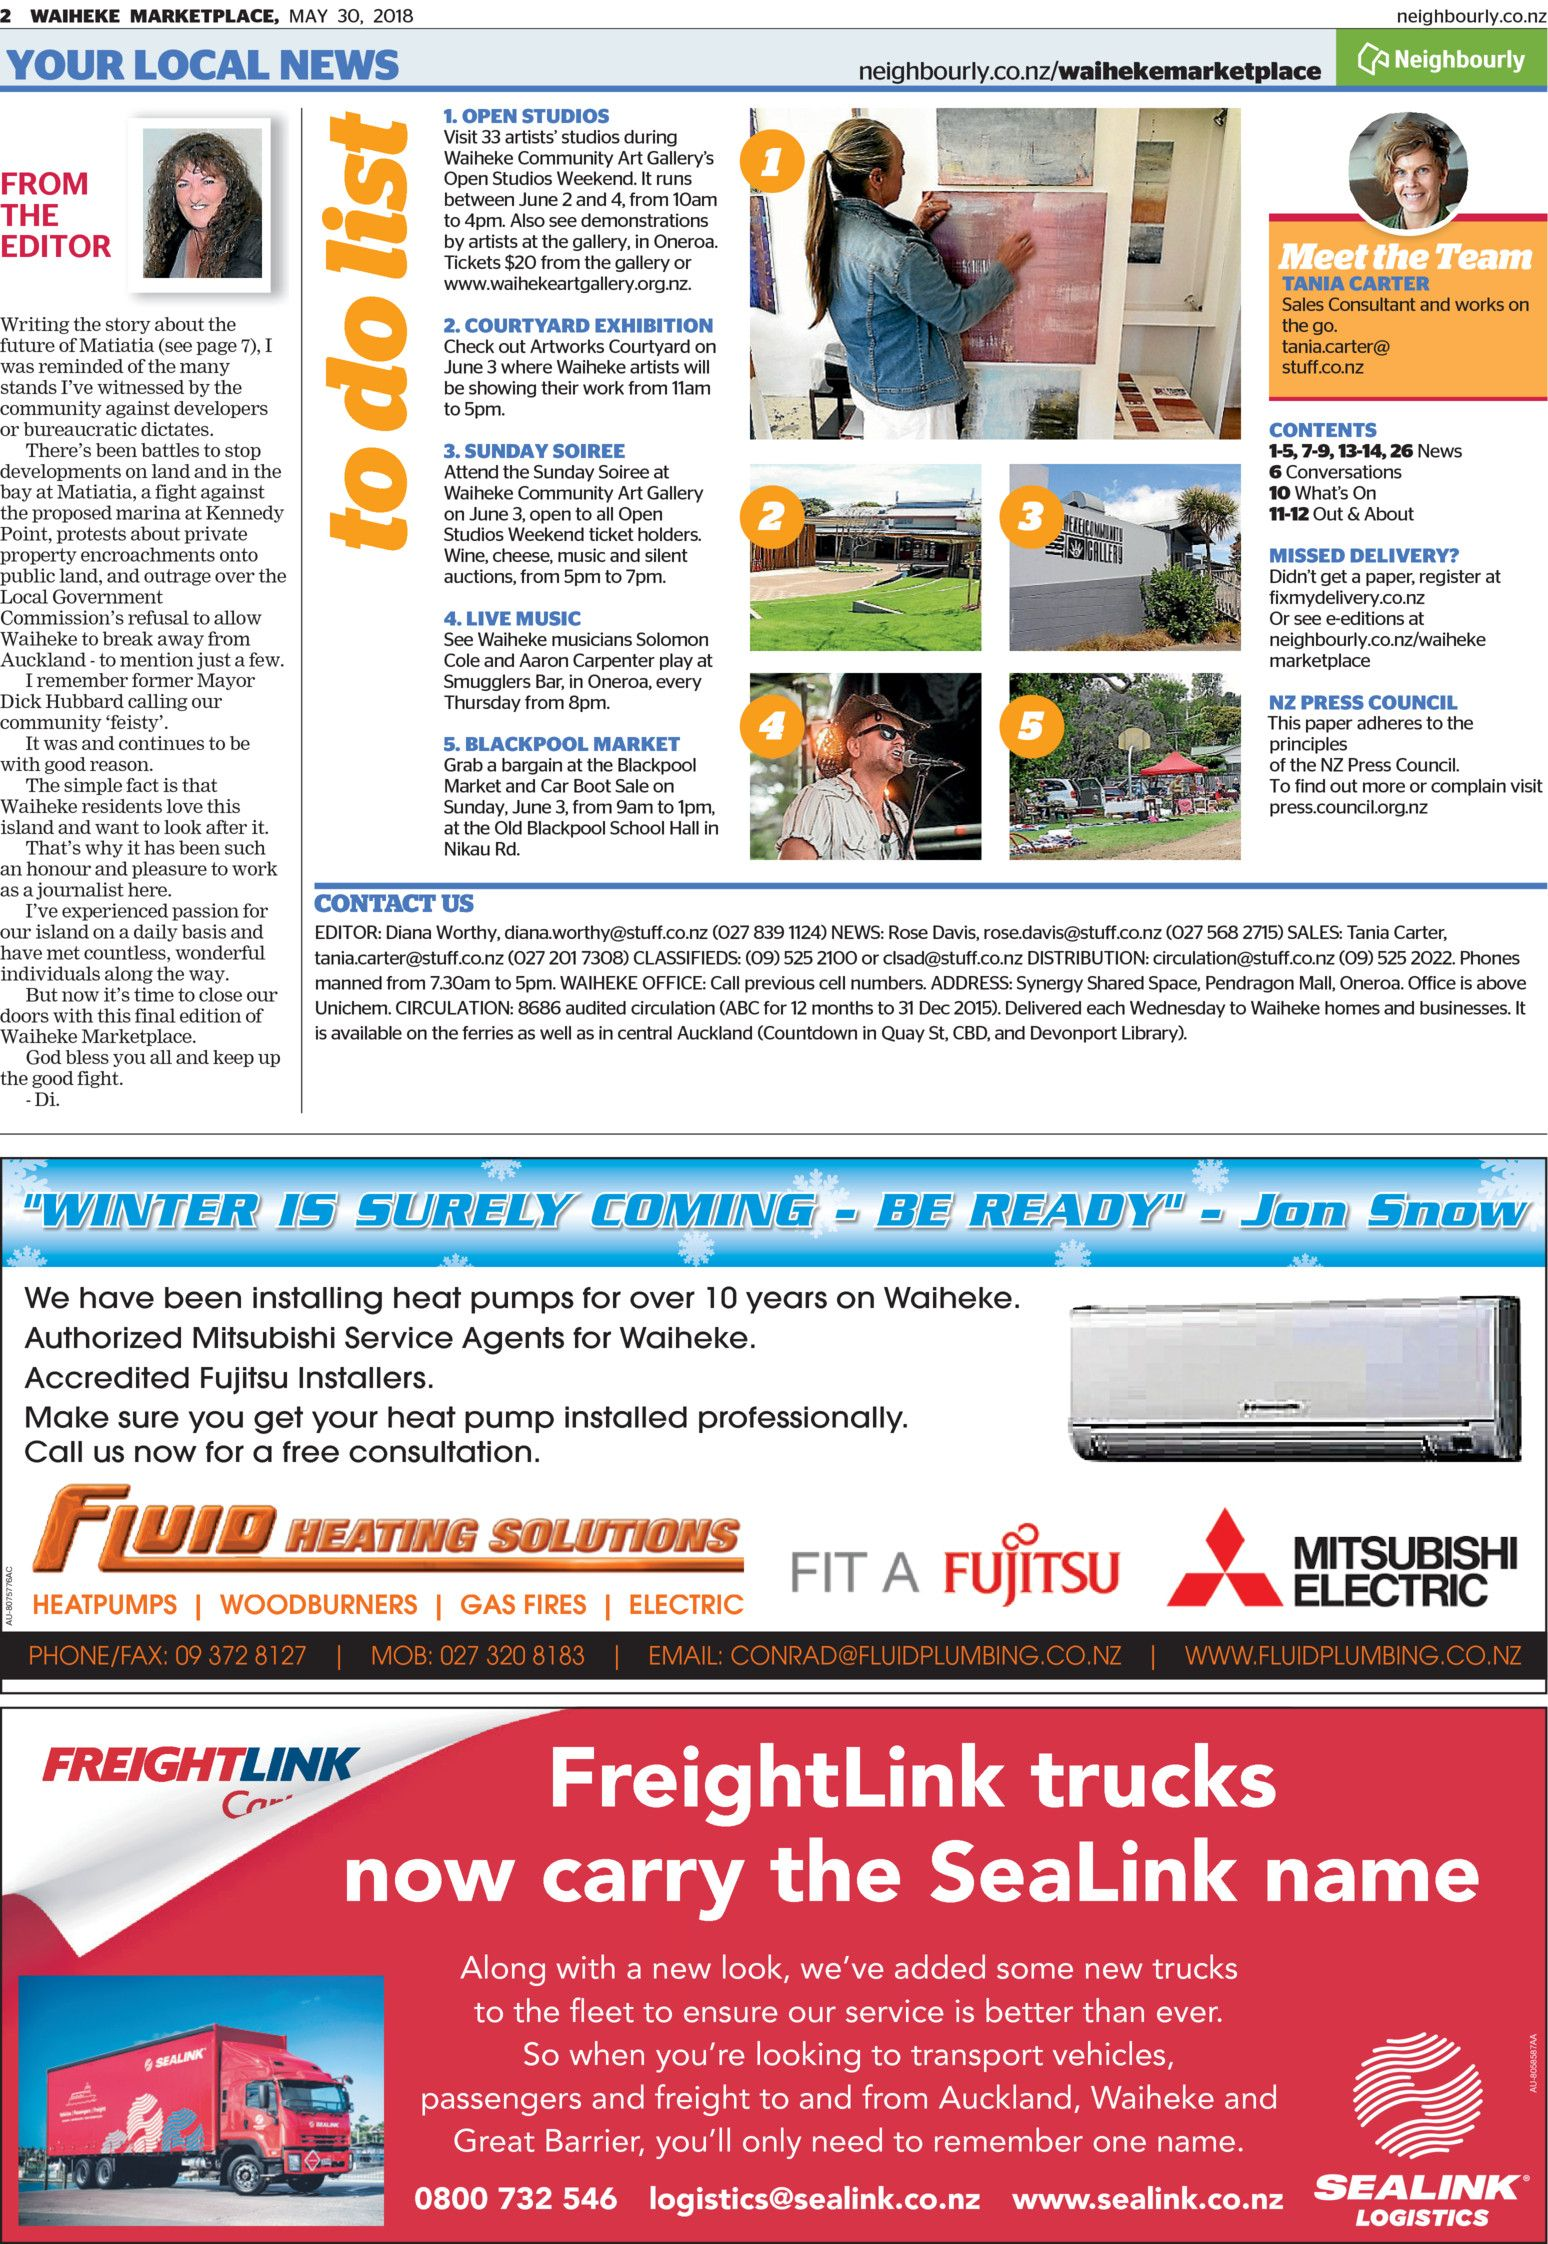 Waiheke Marketplace - Read online on Neighbourly